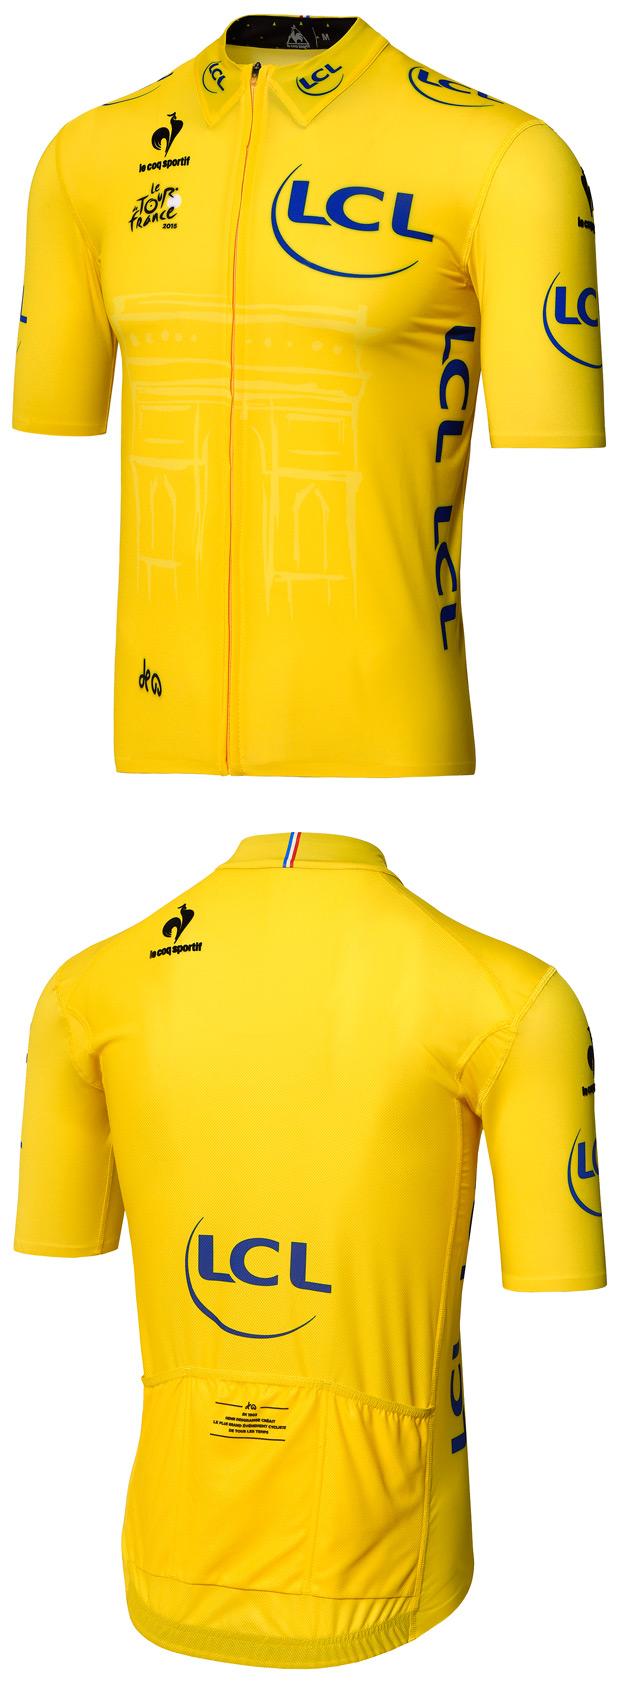 Nuevo maillot amarillo 'Tour de Francia 2015' de le coq sportif